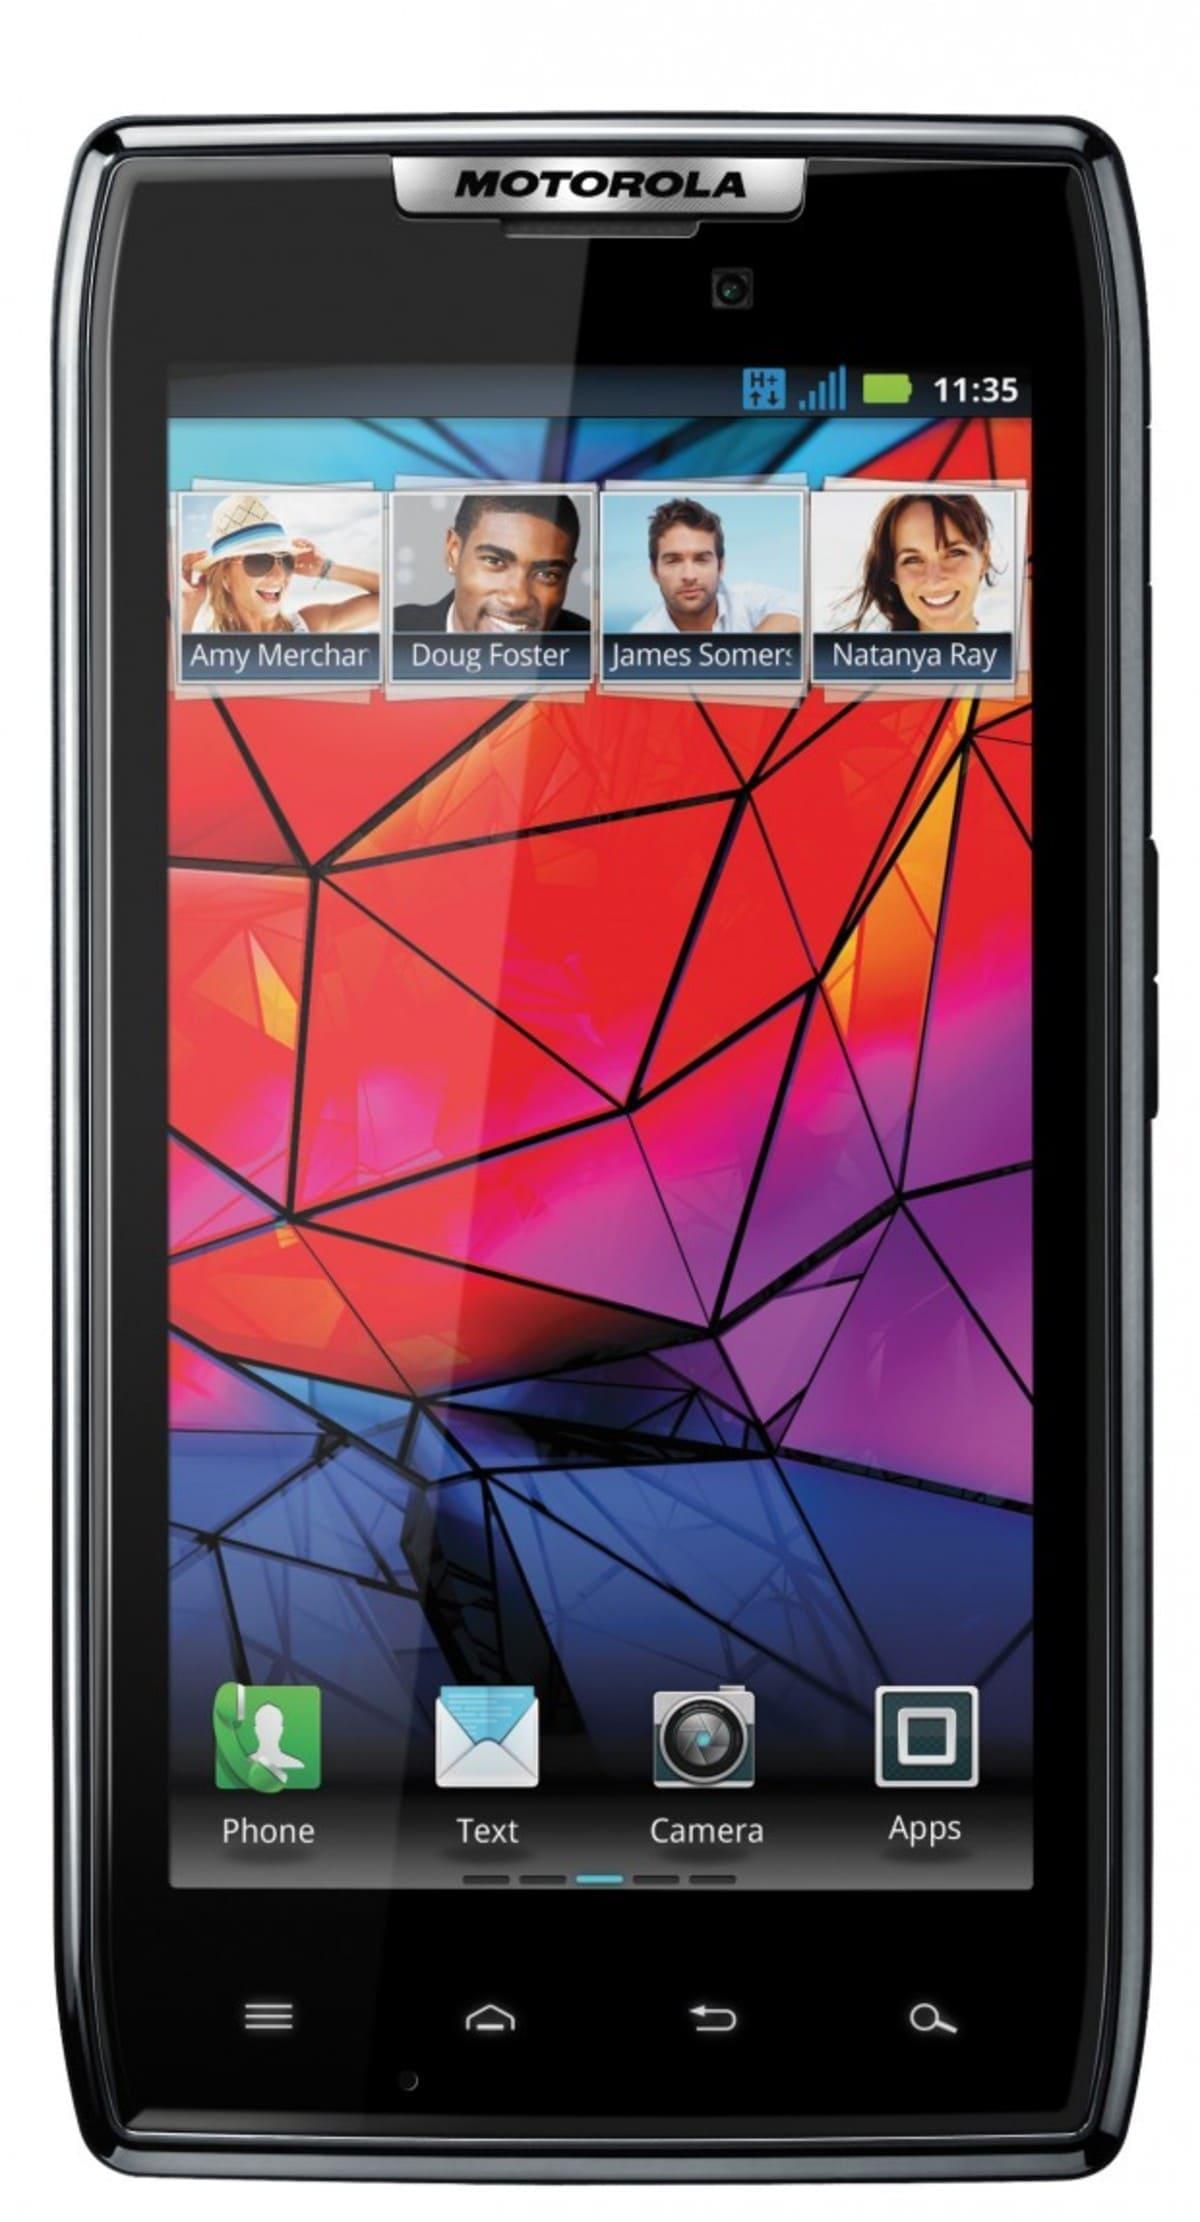 Motorola RAZR 1 e1318960766171 0